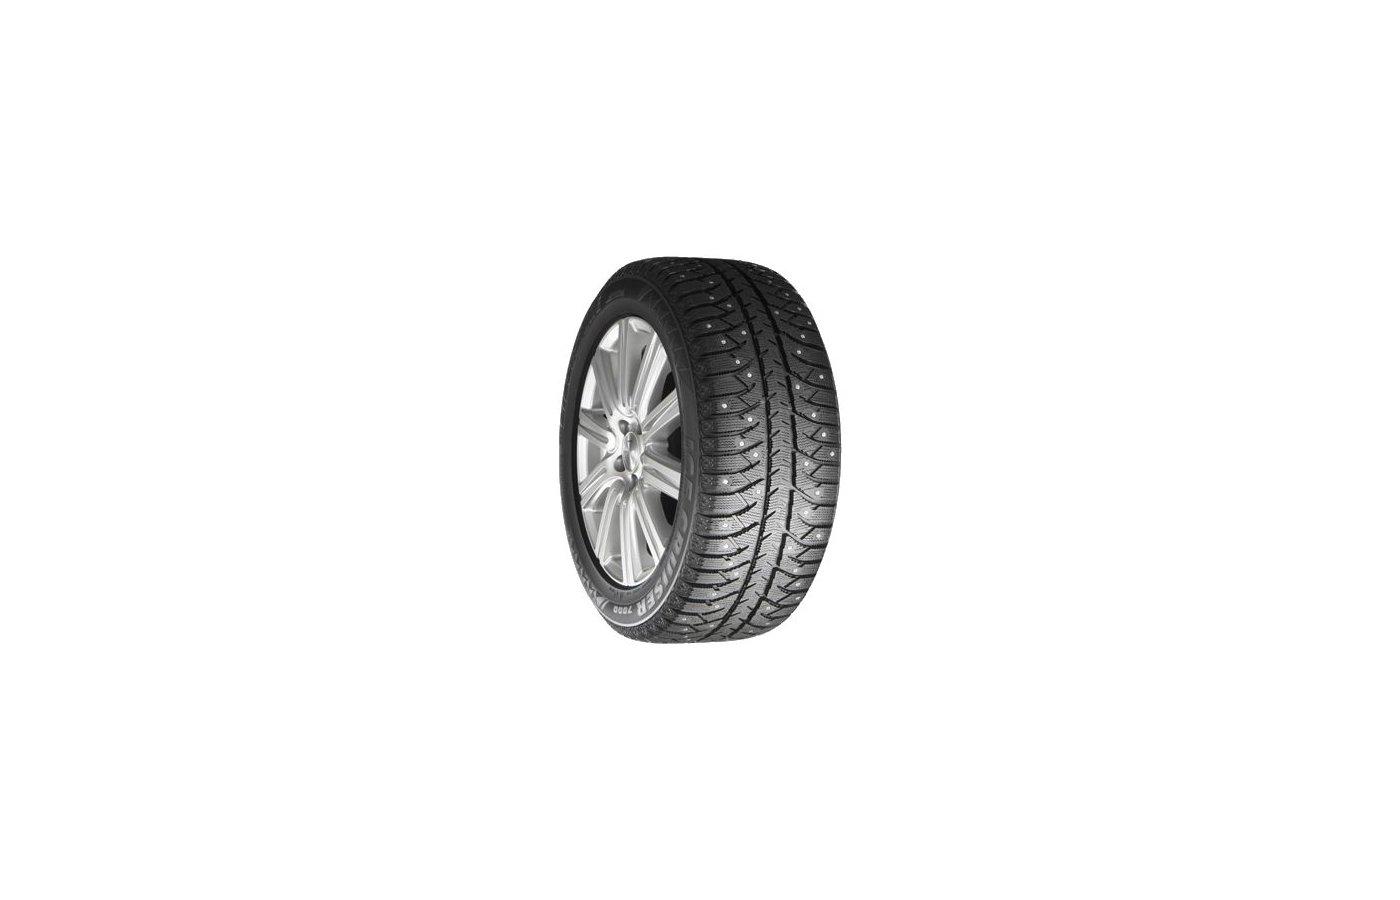 Шина Bridgestone Ice Cruiser 7000 235/40 R18 TL 91T шип